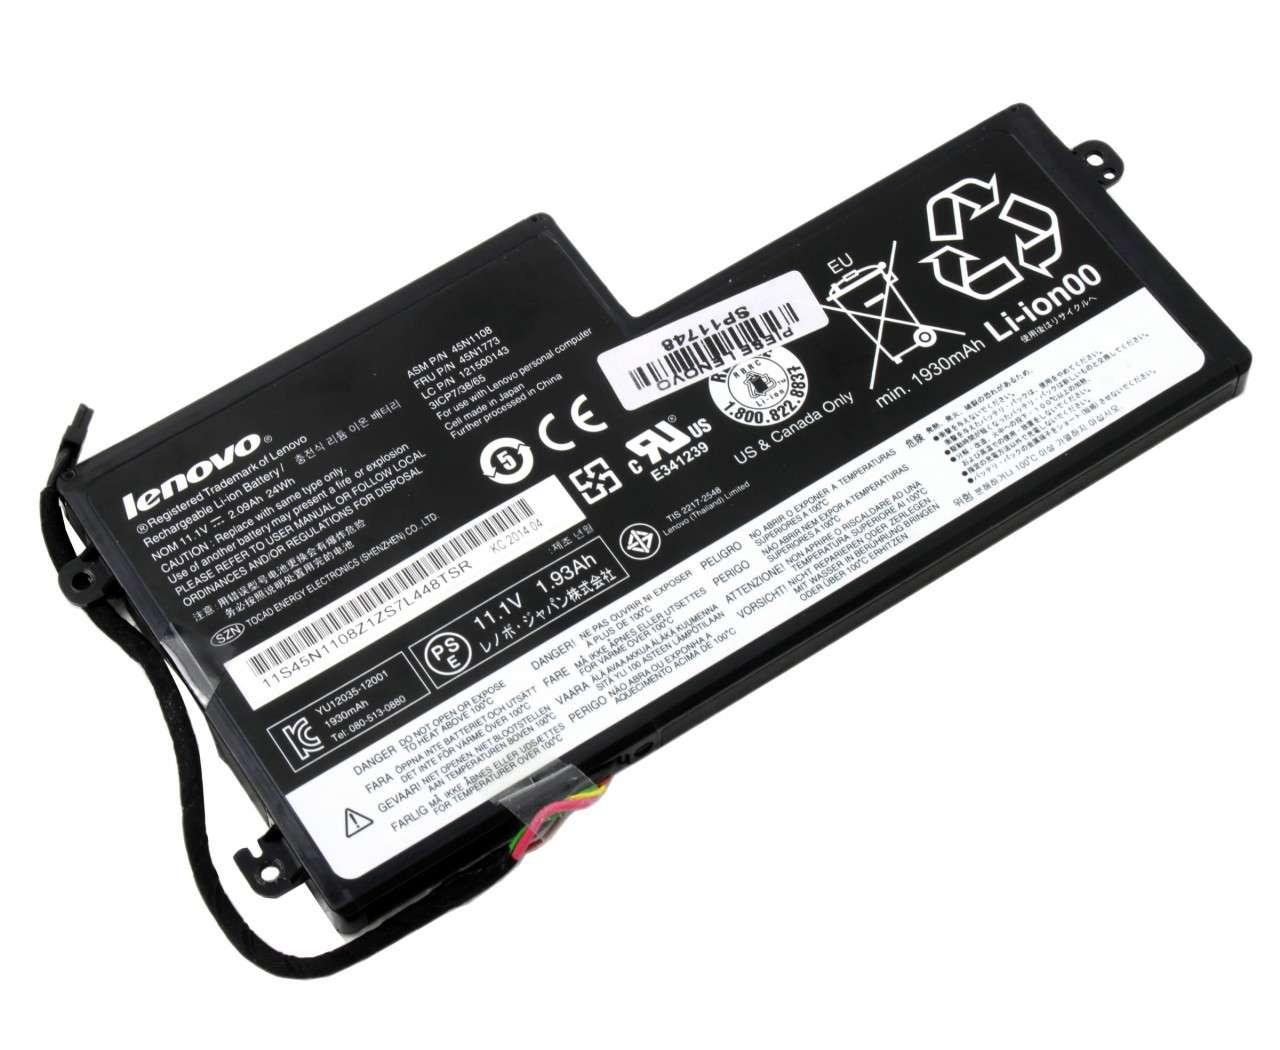 Baterie Lenovo ThinkPad T530 2393 Originala 24Wh imagine powerlaptop.ro 2021